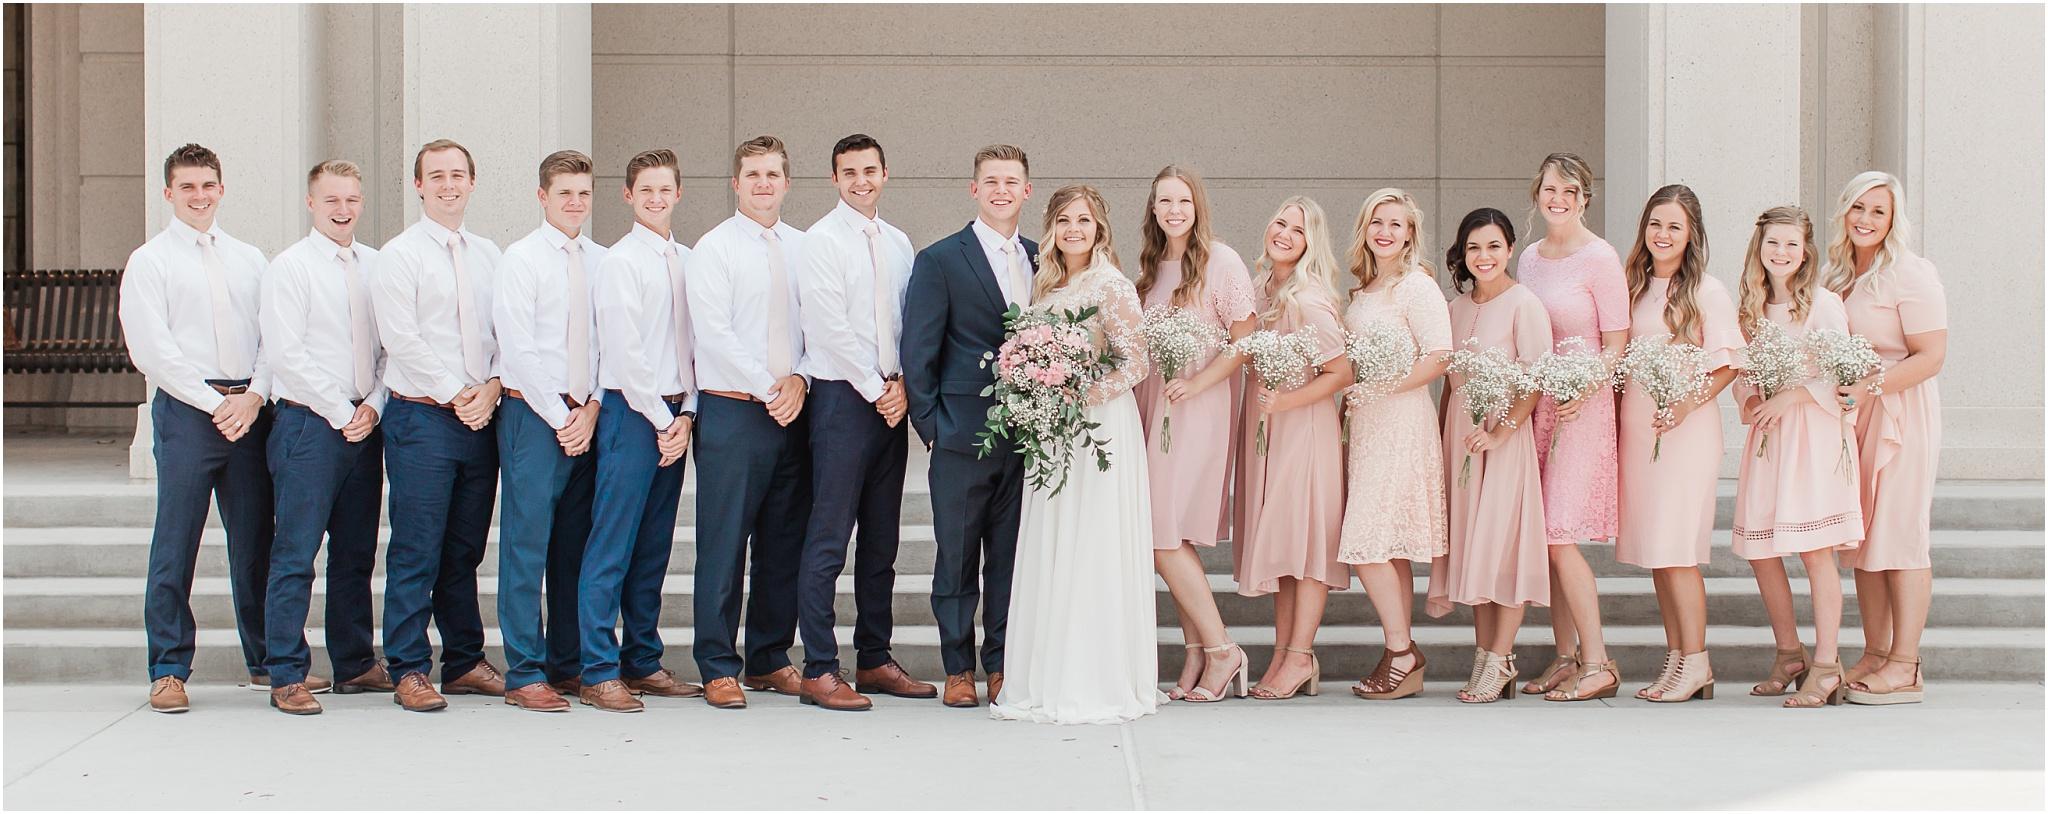 Wedding Photography_Meridian Idaho Temple_Boise Idaho_Nampa Idaho_Leah Southwick Photography_0042.jpg